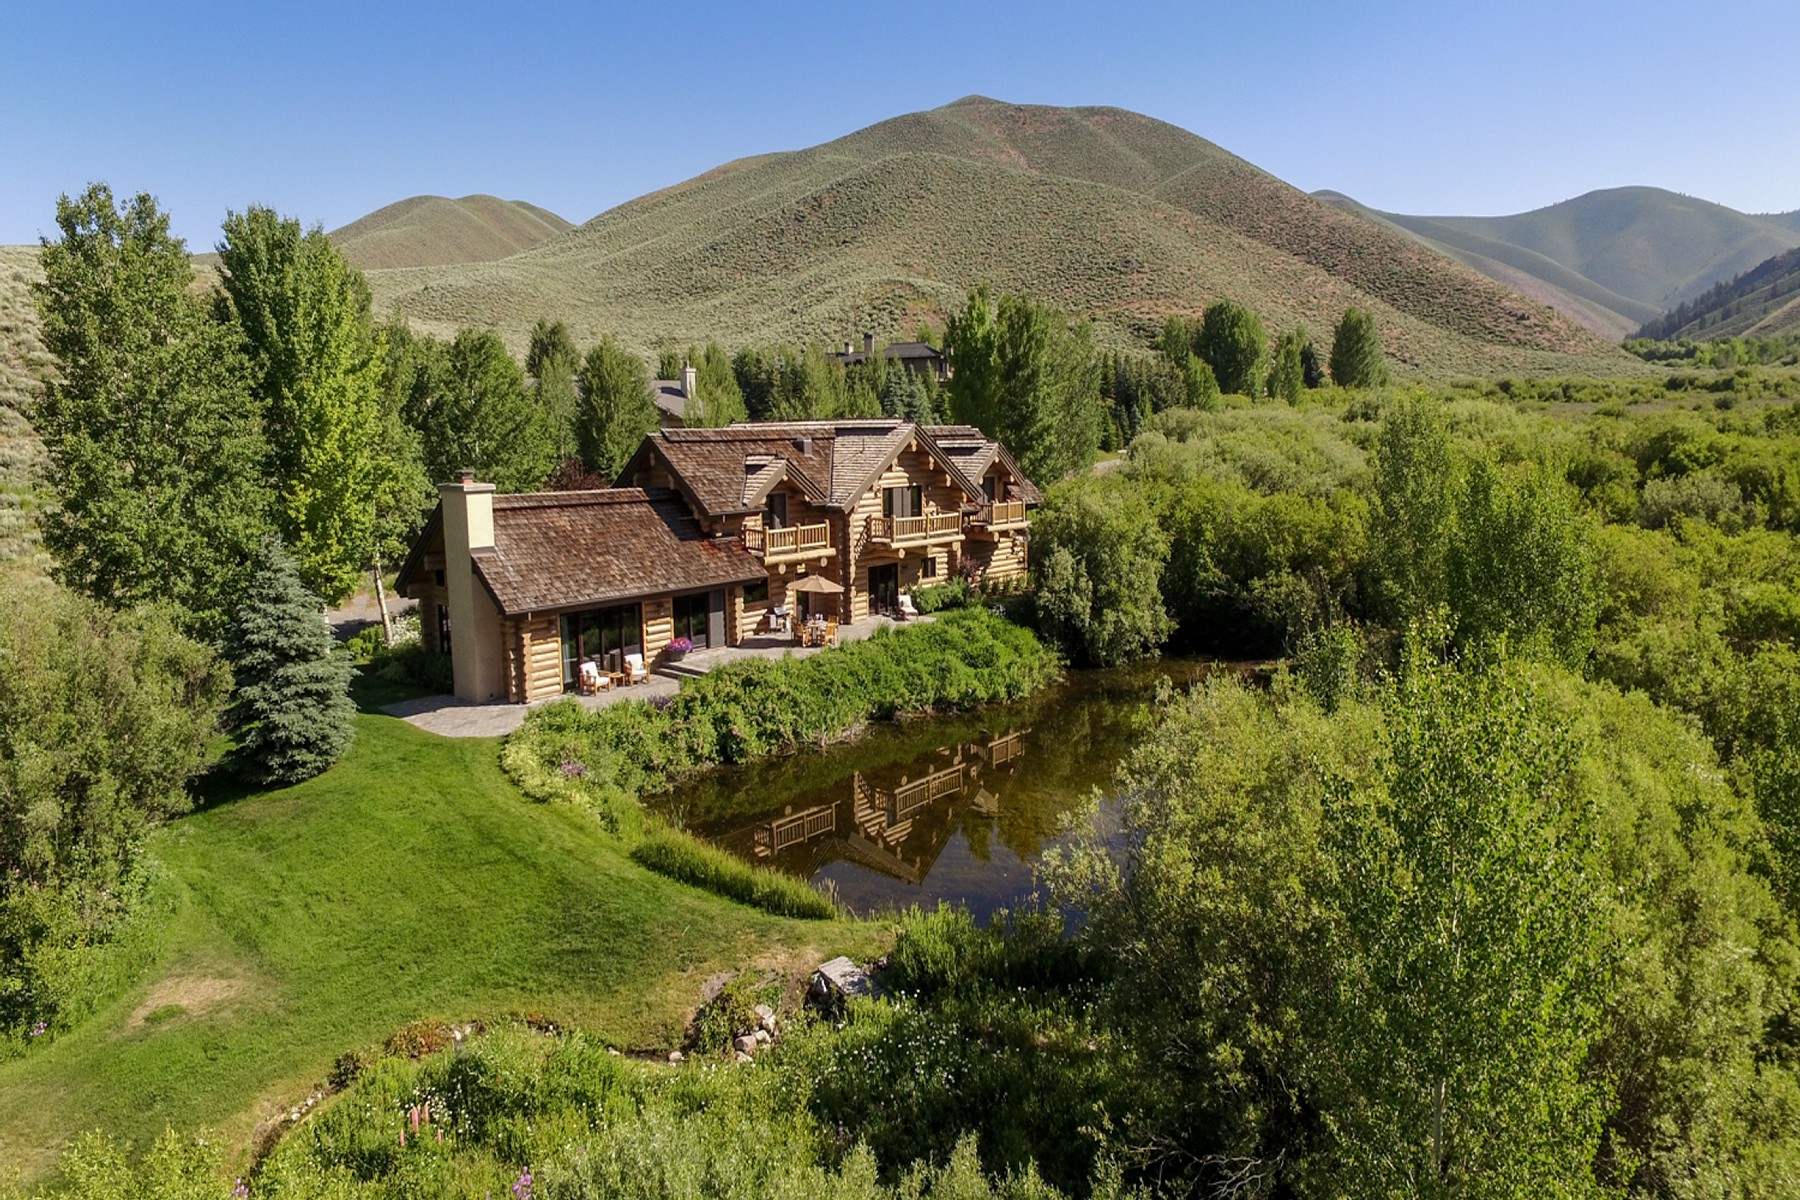 Casa Unifamiliar por un Venta en Waterfront Lodge-Style Sun Valley Home 104 Silver Queen Dr Elkhorn, Sun Valley, Idaho, 83353 Estados Unidos